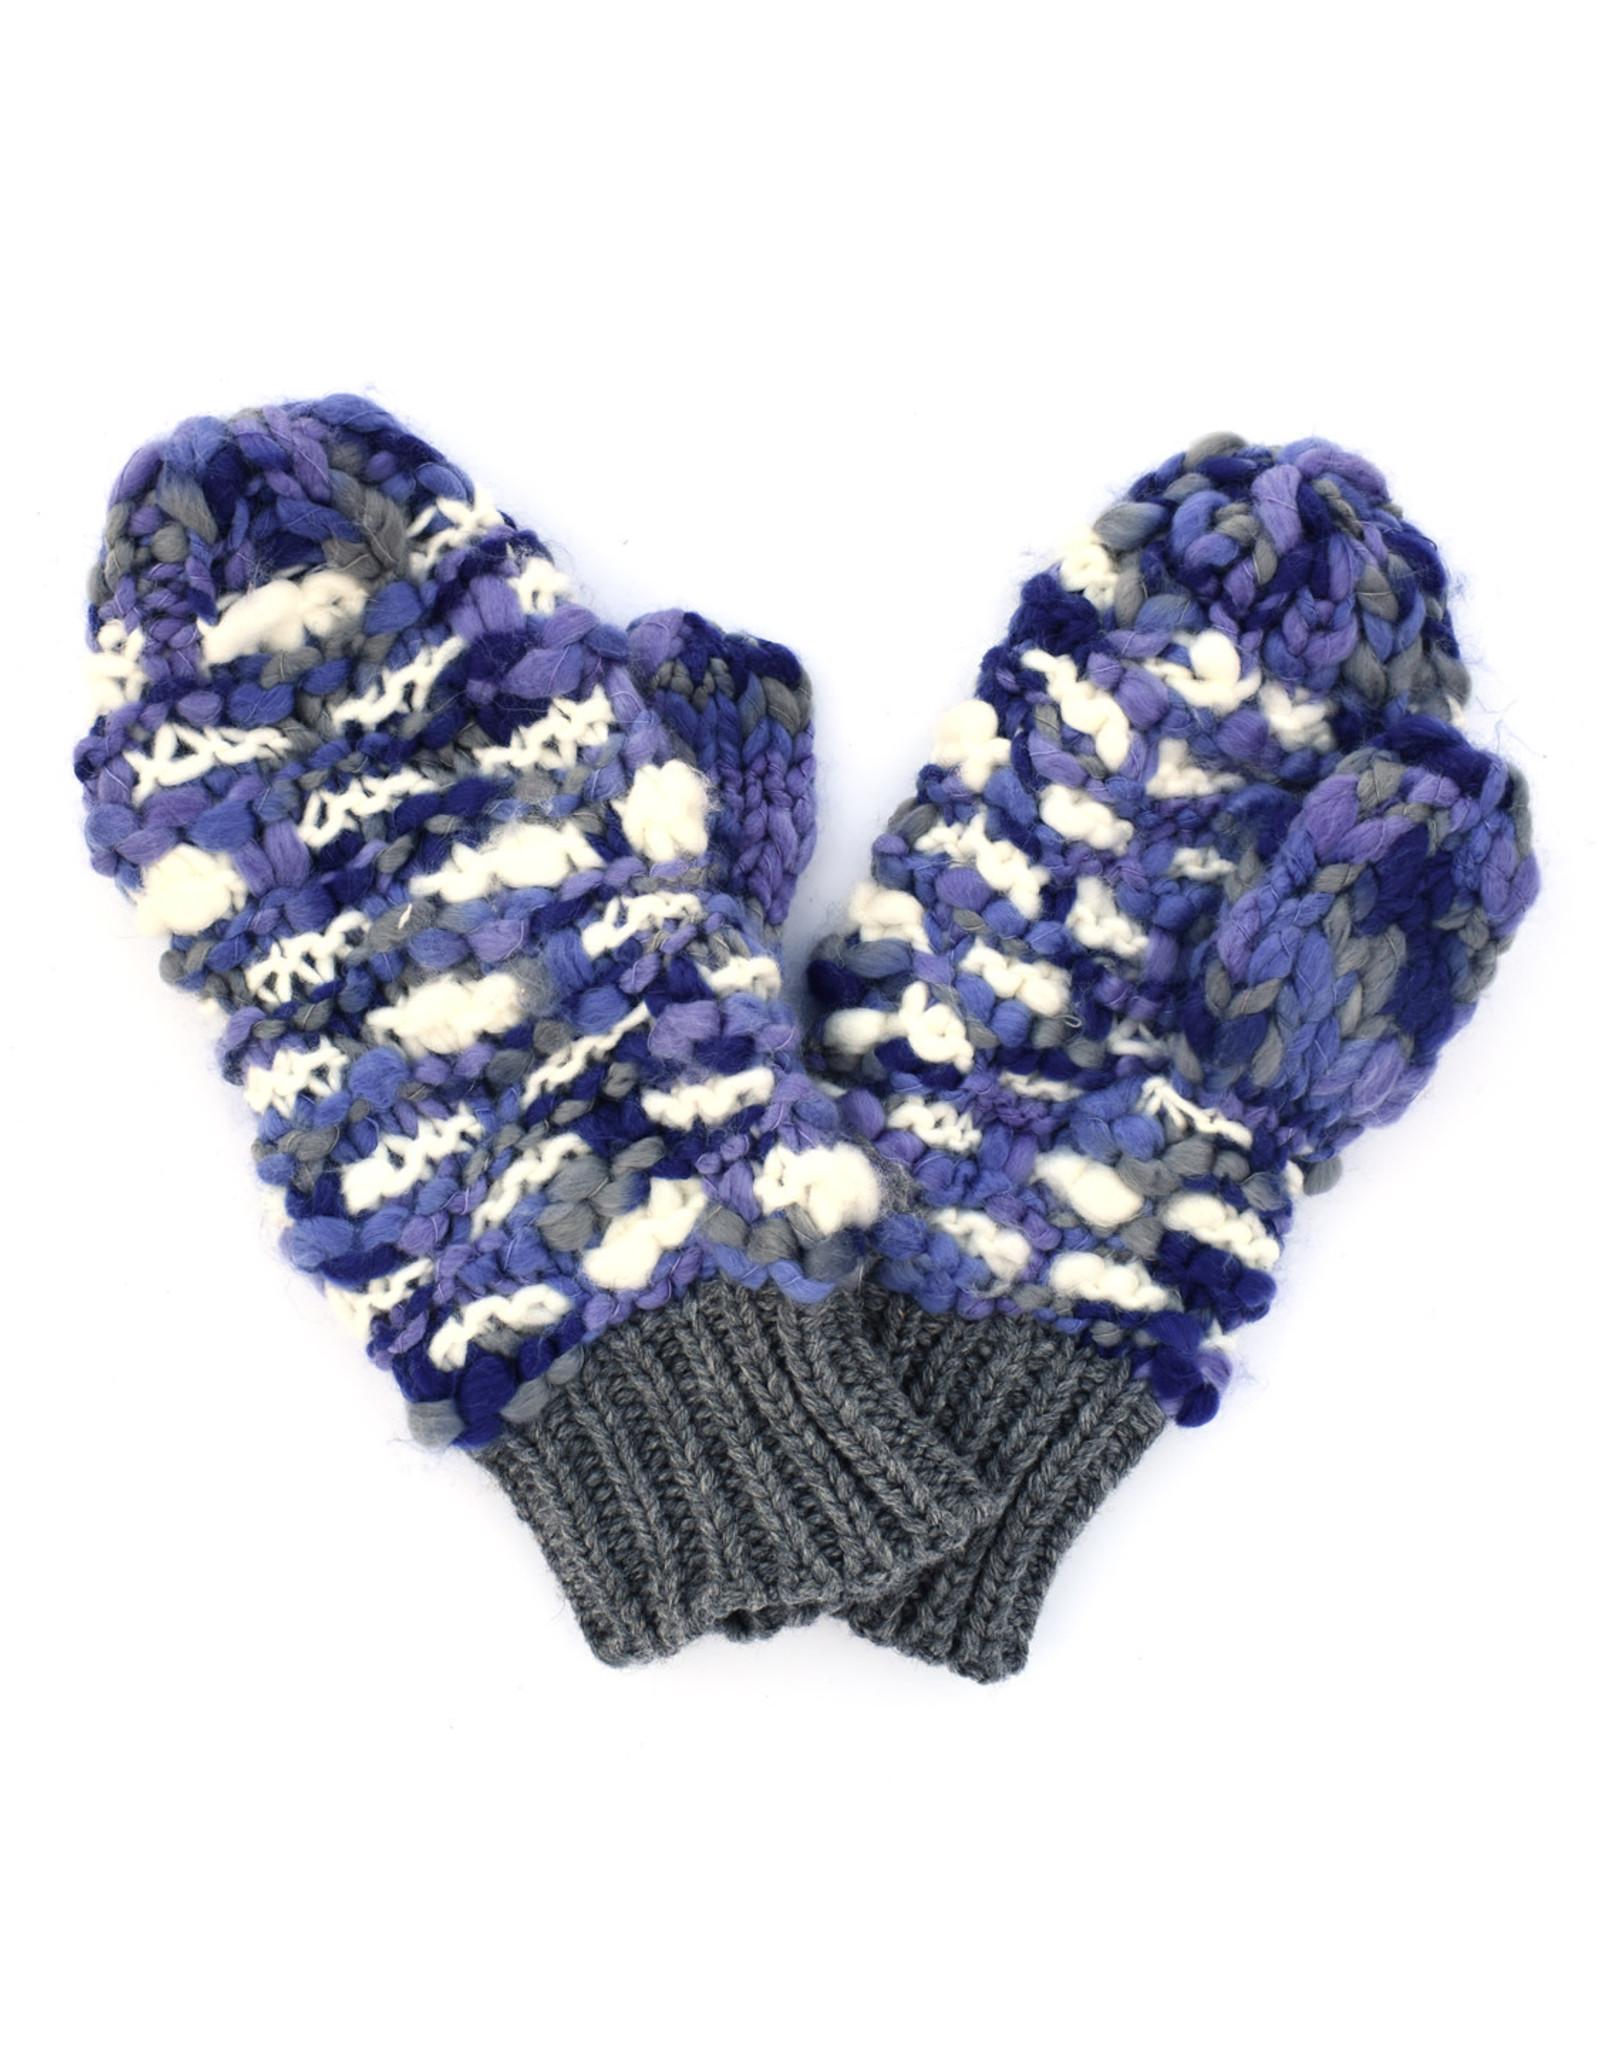 Hand Knitted Mitten - Blue